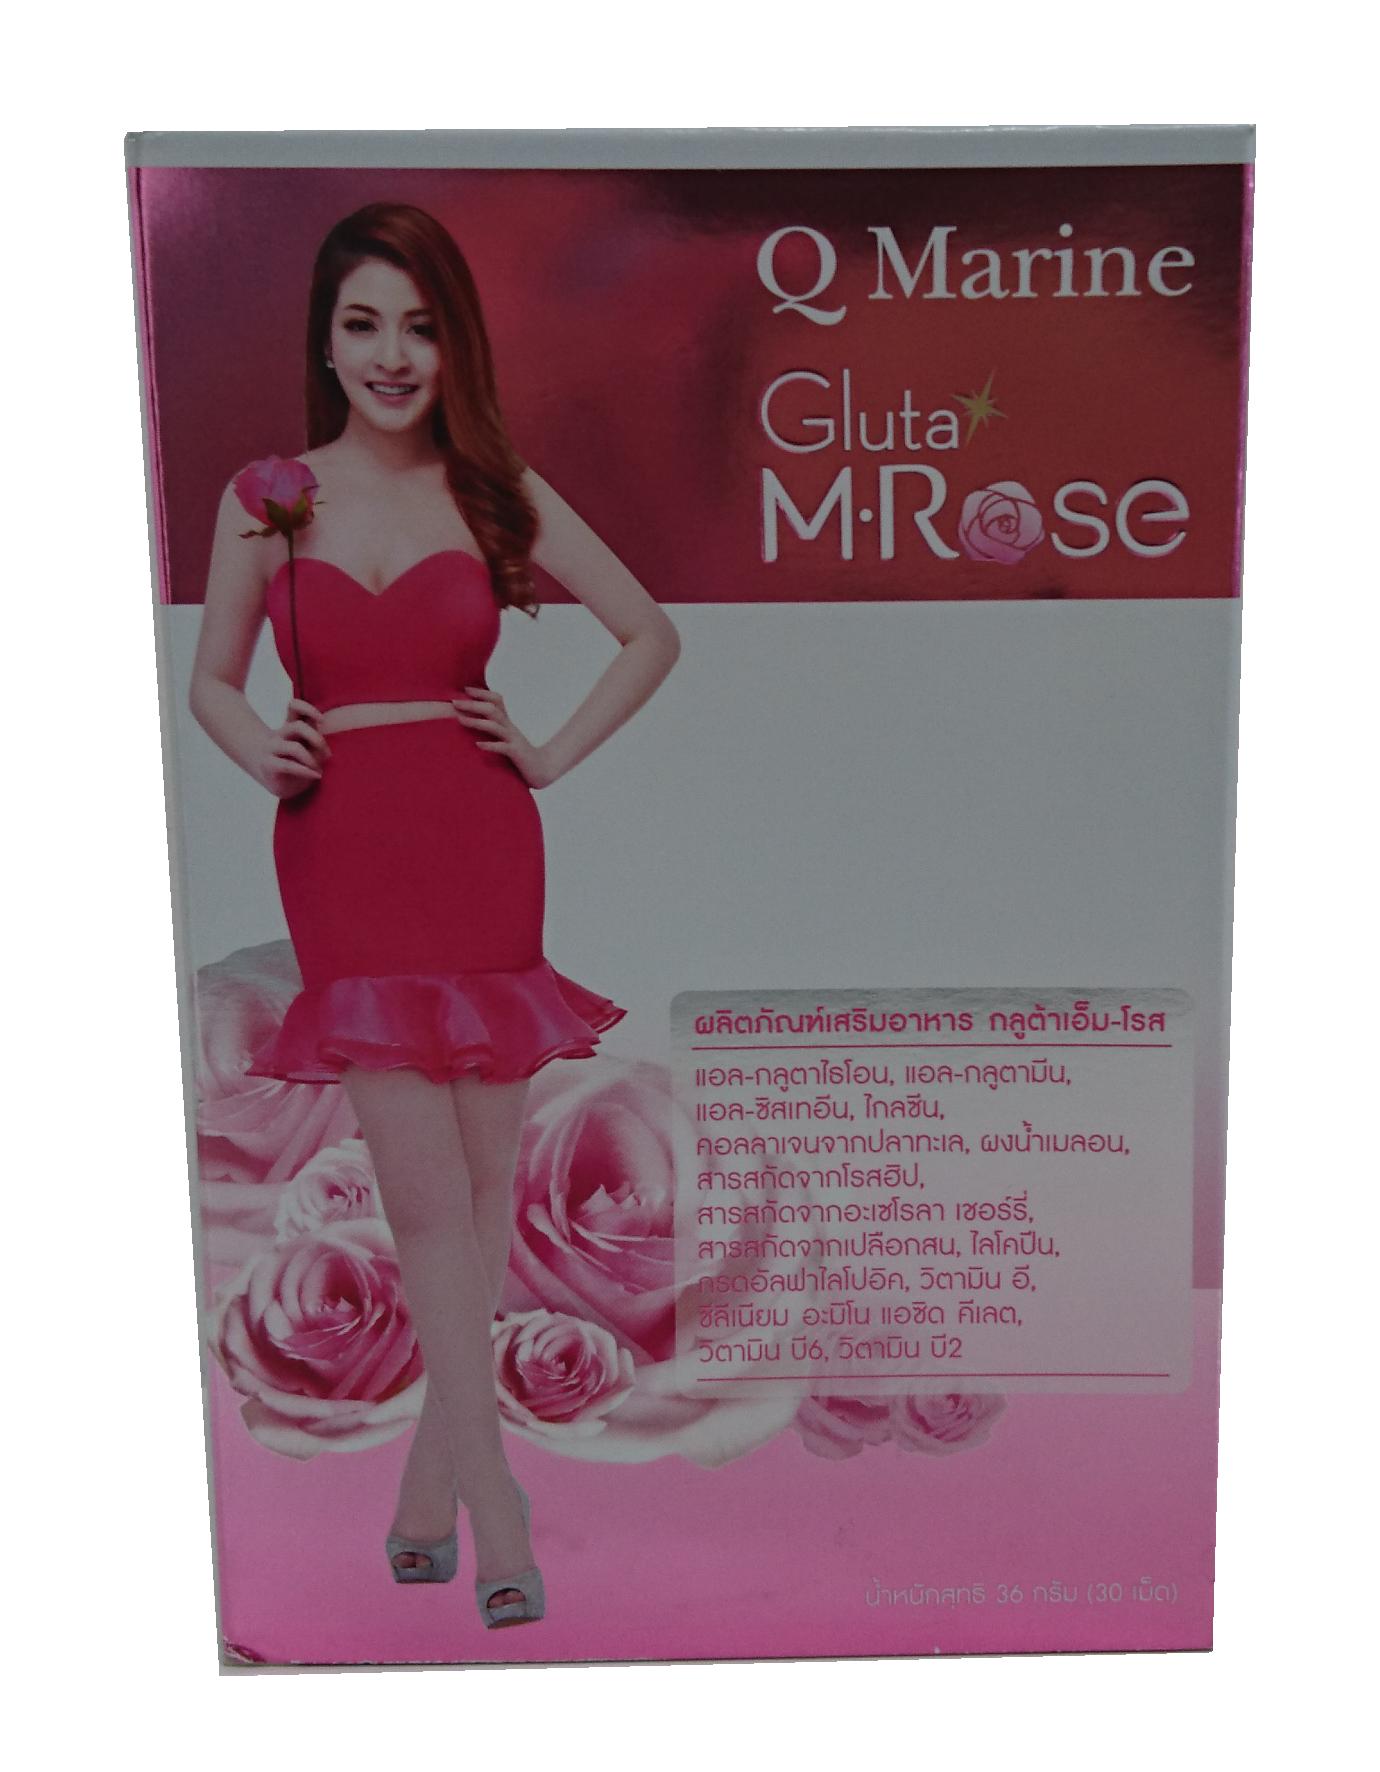 Q Marine Gluta M.Rose คิว มารีน กลูต้า เอ็ม.โรส บรรจุ 30 เม็ด